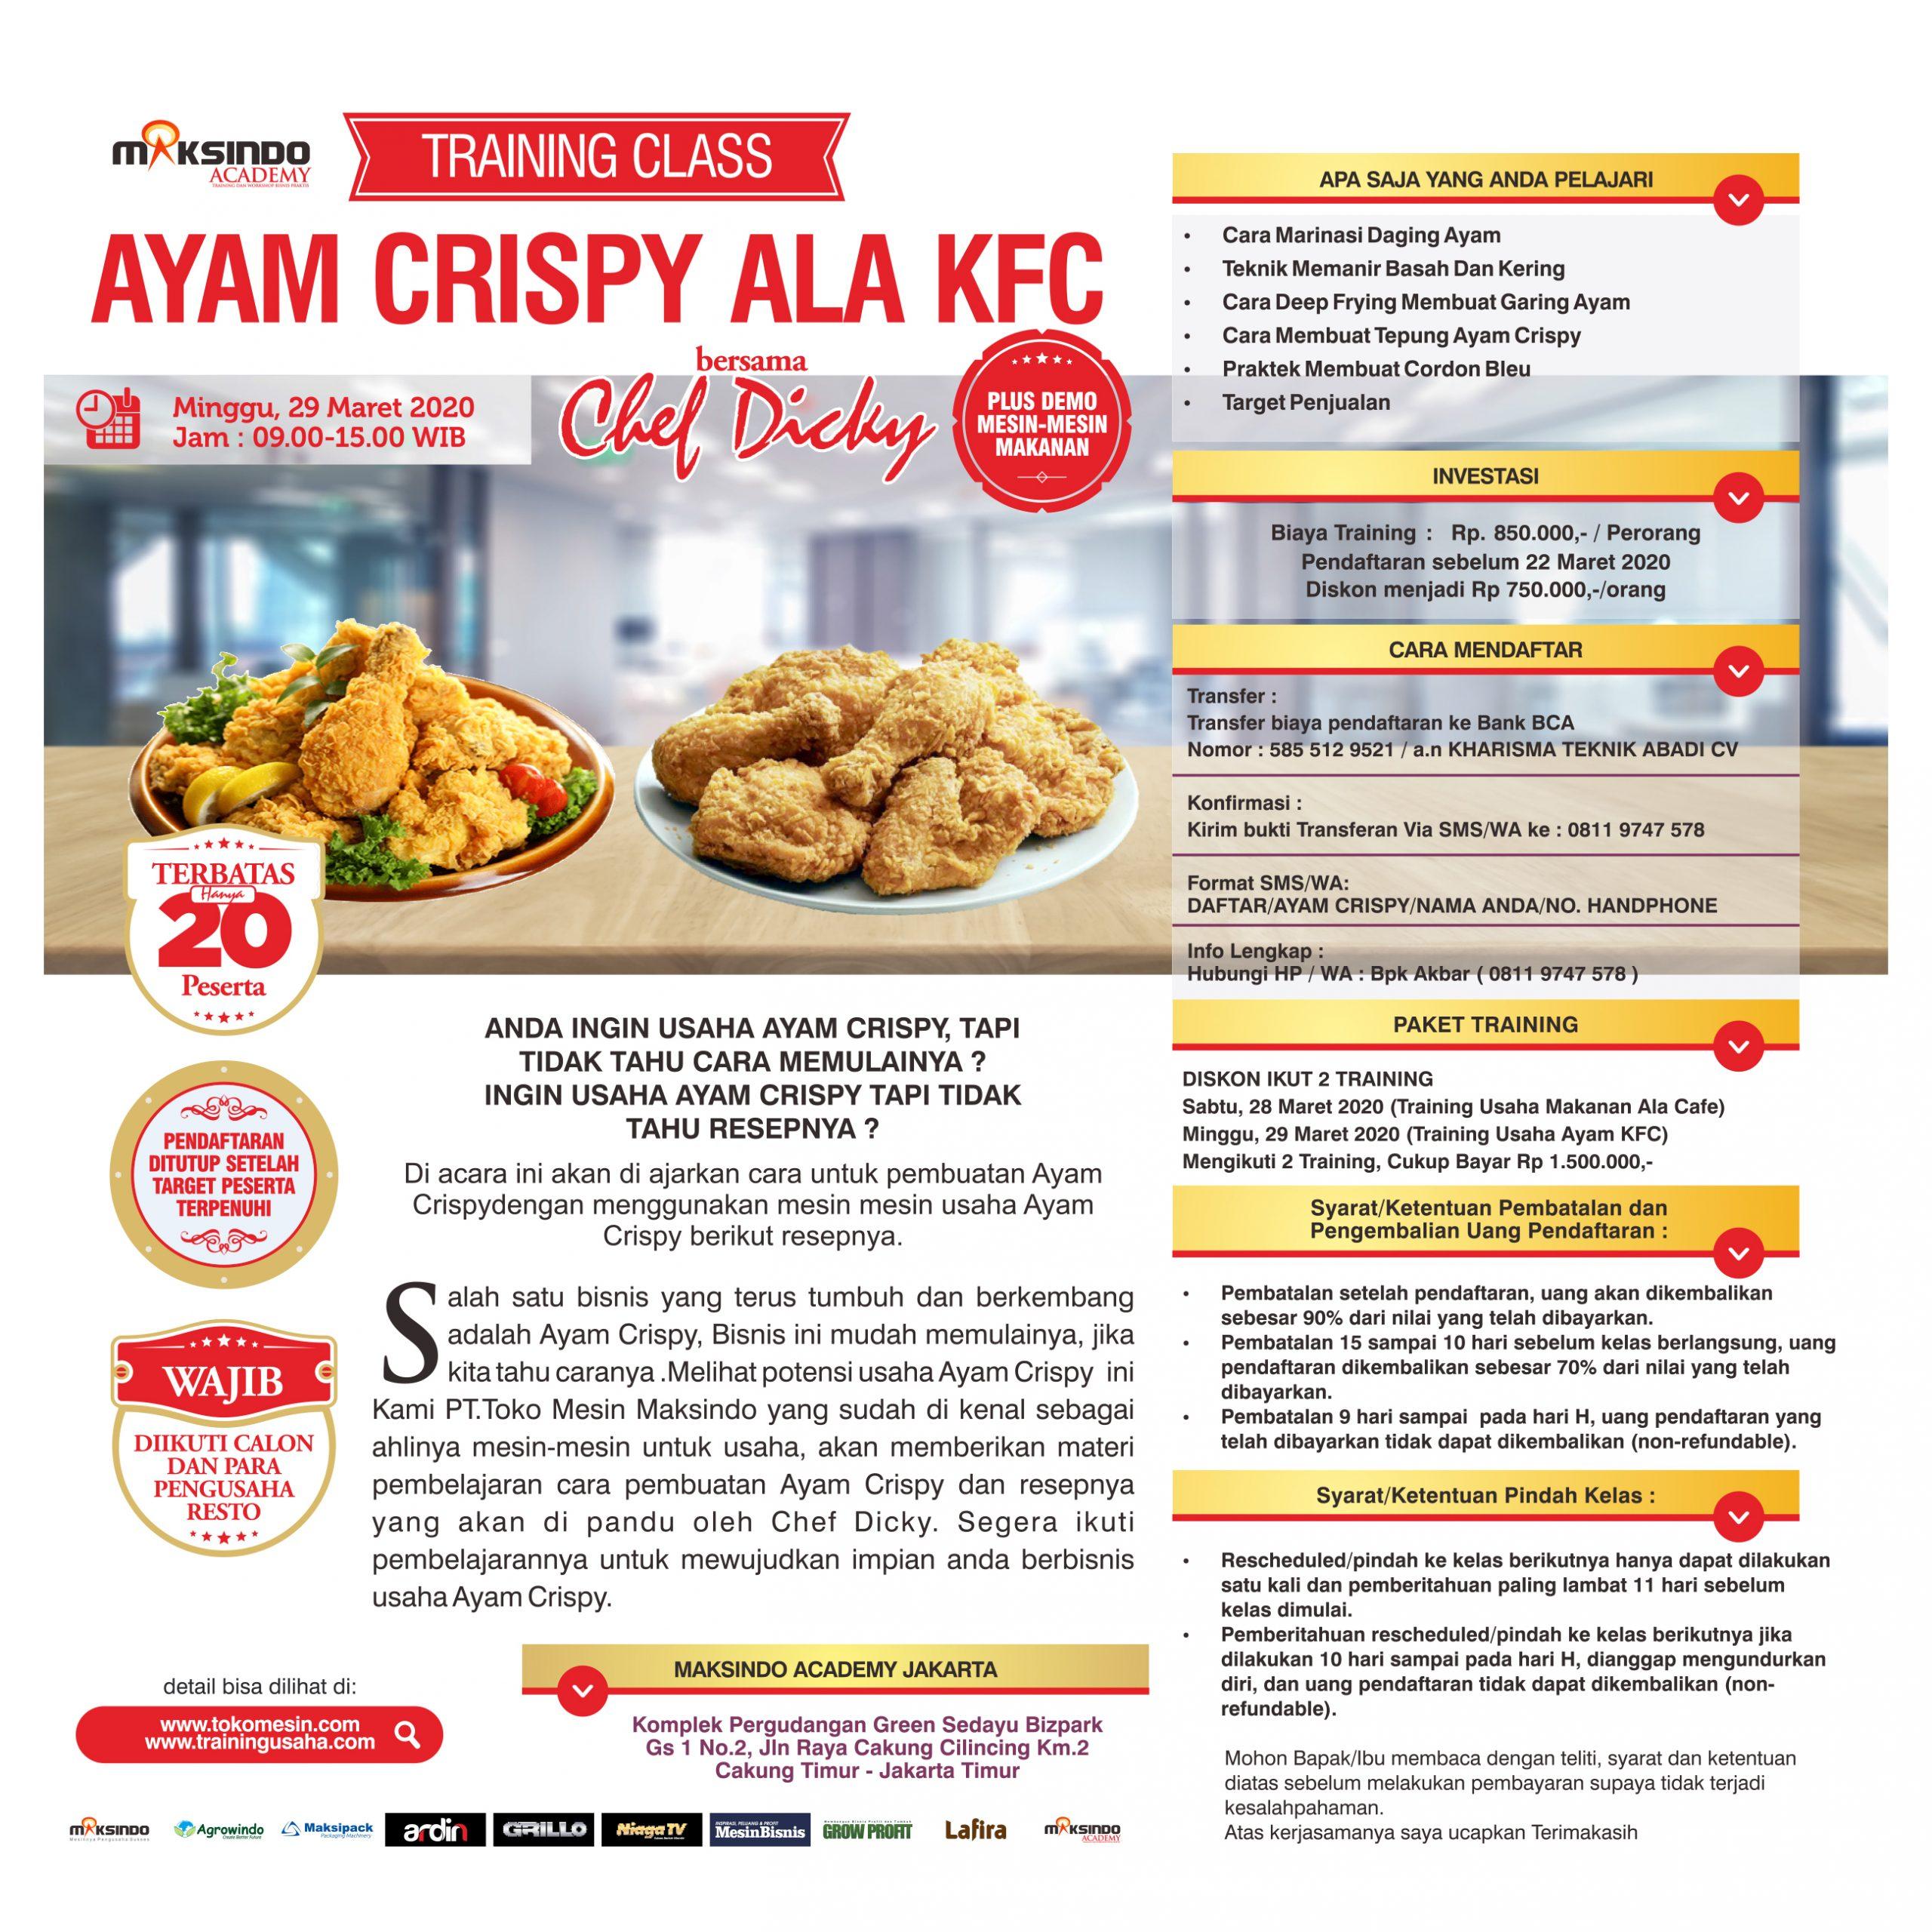 Training Class Ayam Crispy Ala KFC Minggu, 29 Maret 2020